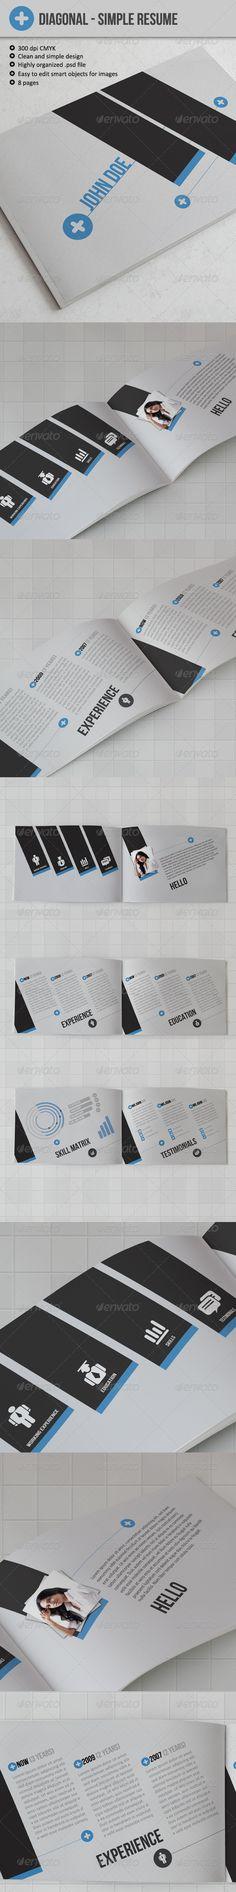 Diagonal - Resume or CV - GraphicRiver Item for Sale